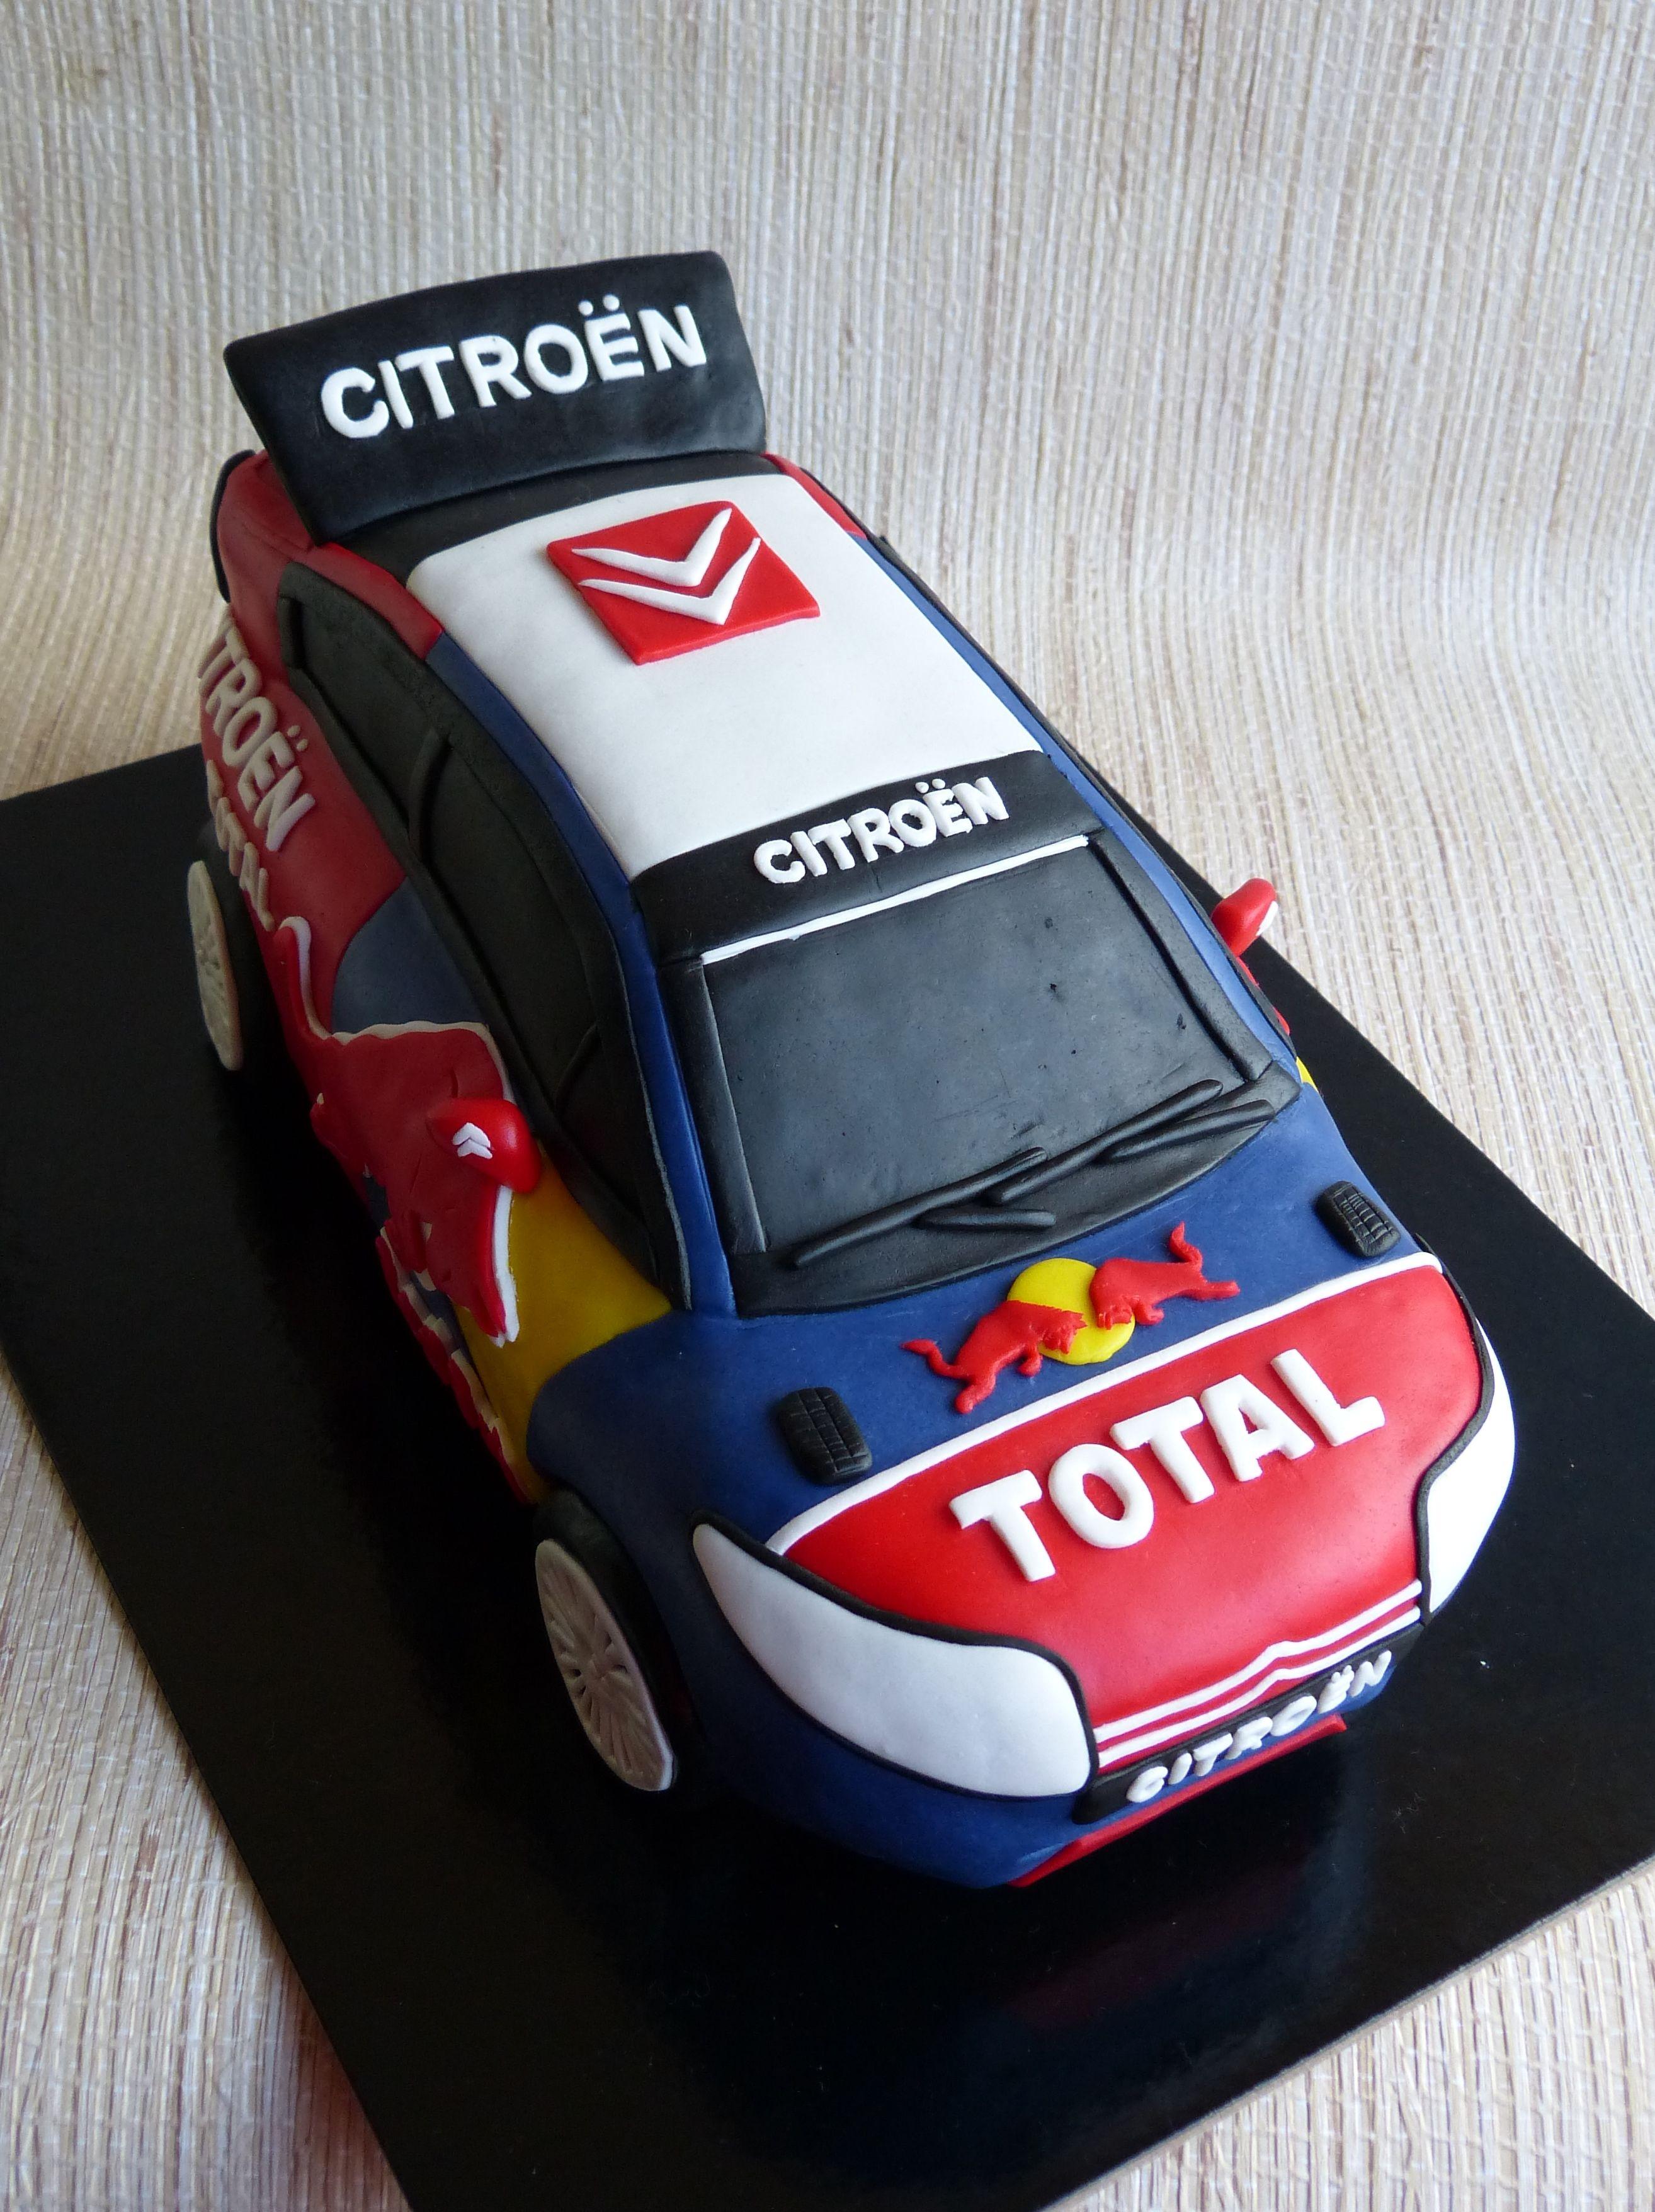 Rally Citroen Wrc Www Facebook Com Havesomesugar Torte